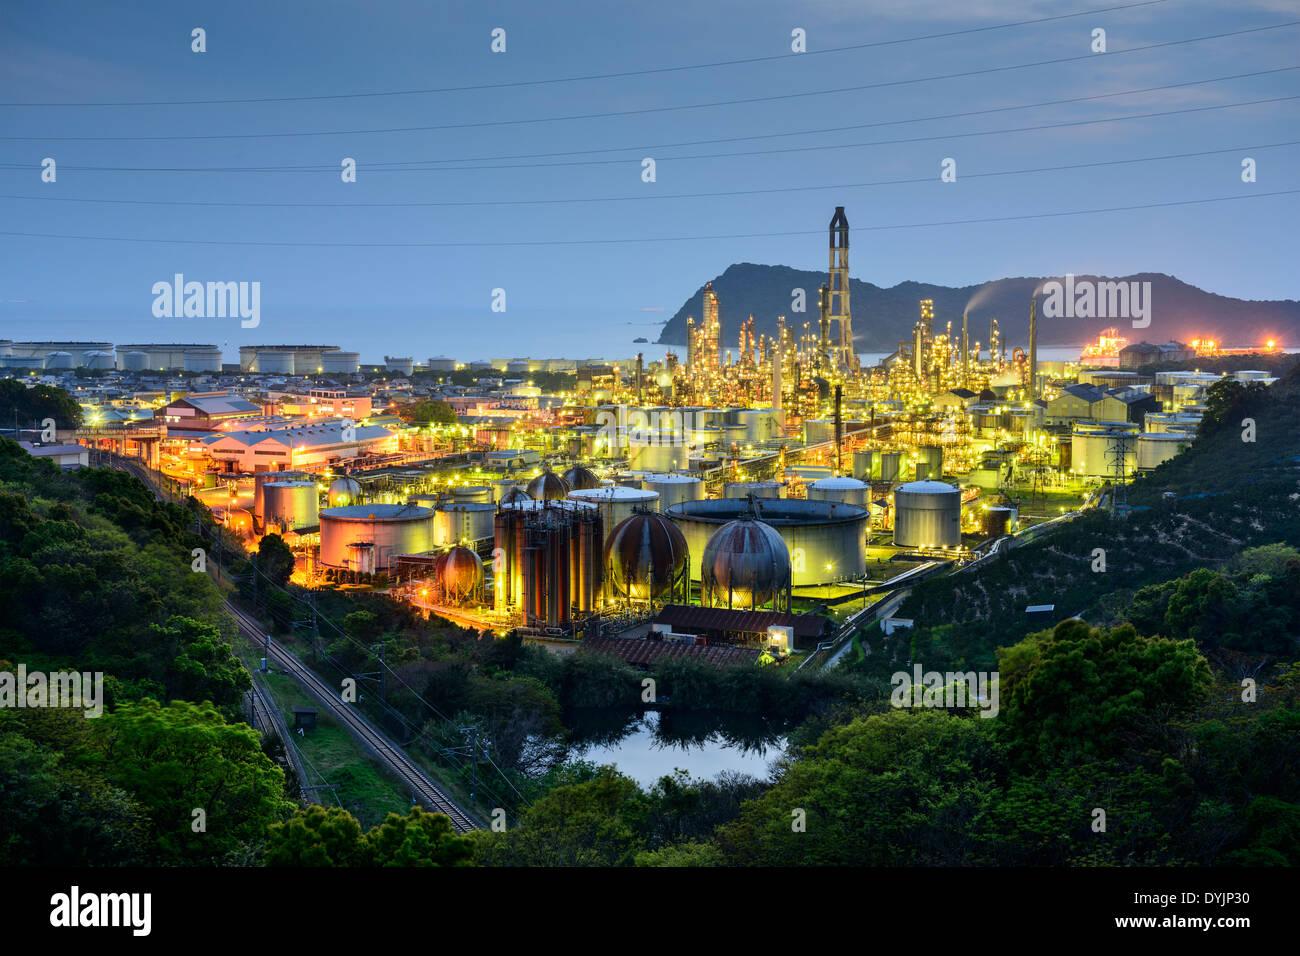 Oil Refineries in Wakayama, Japan. - Stock Image